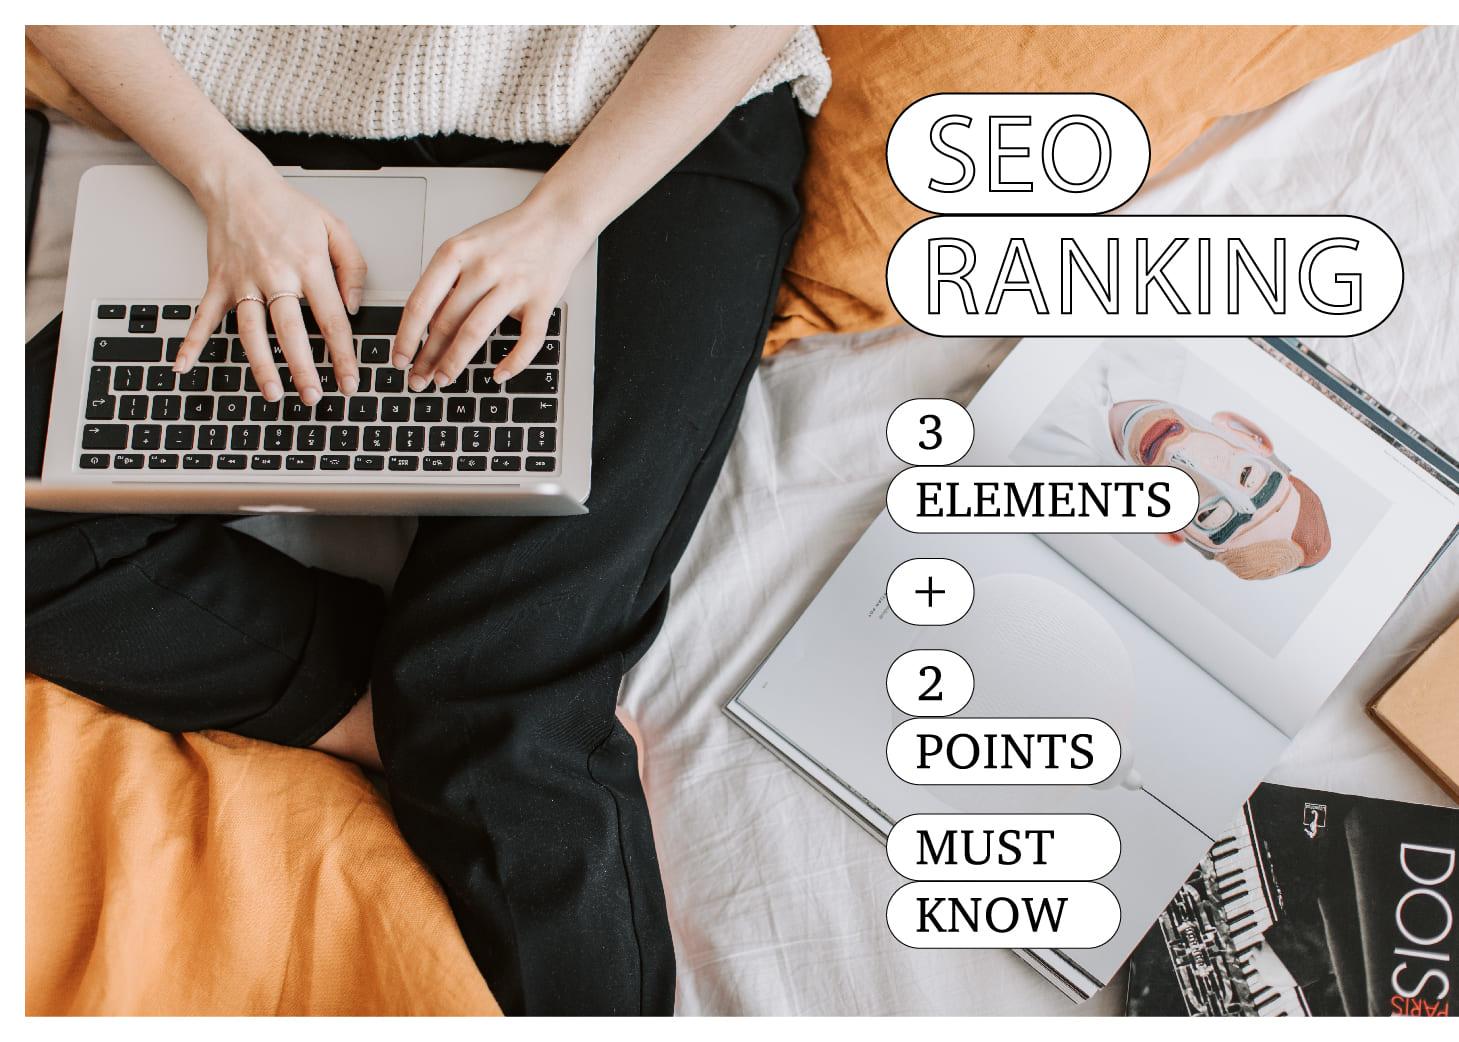 SEO RANKING 3 Elements + 2 Points Must Know改變人類的搜尋方式:「SEO 搜尋引擎最佳化」到底什麼意思?3元素+2重點必須掌握